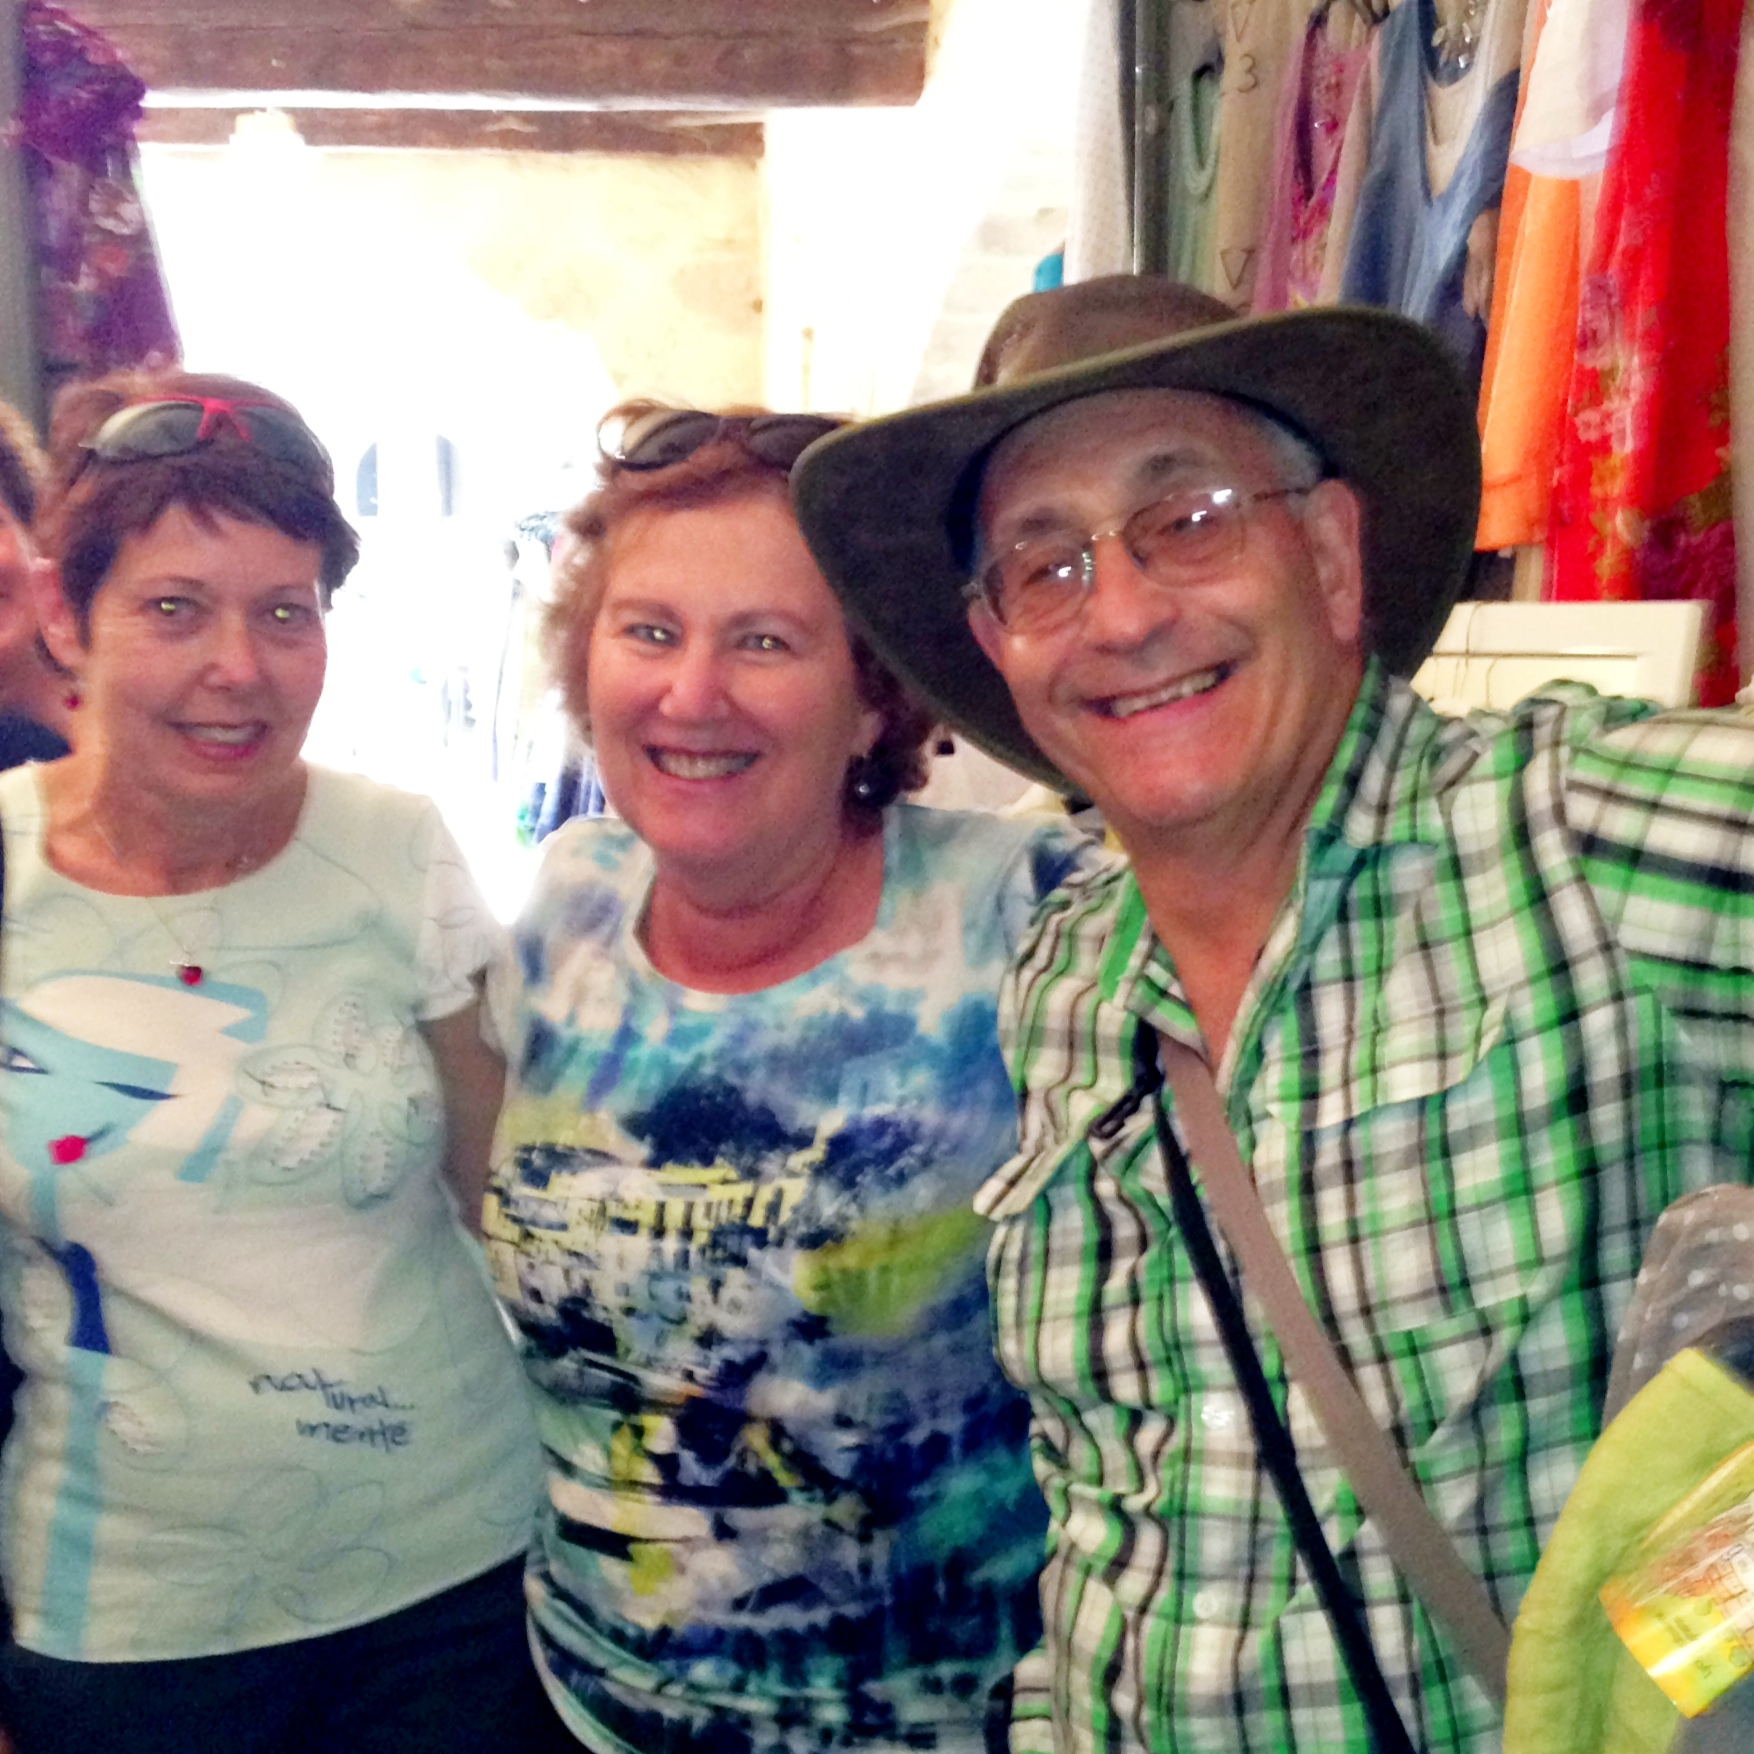 Australian friends and fashion advisors in Uzes